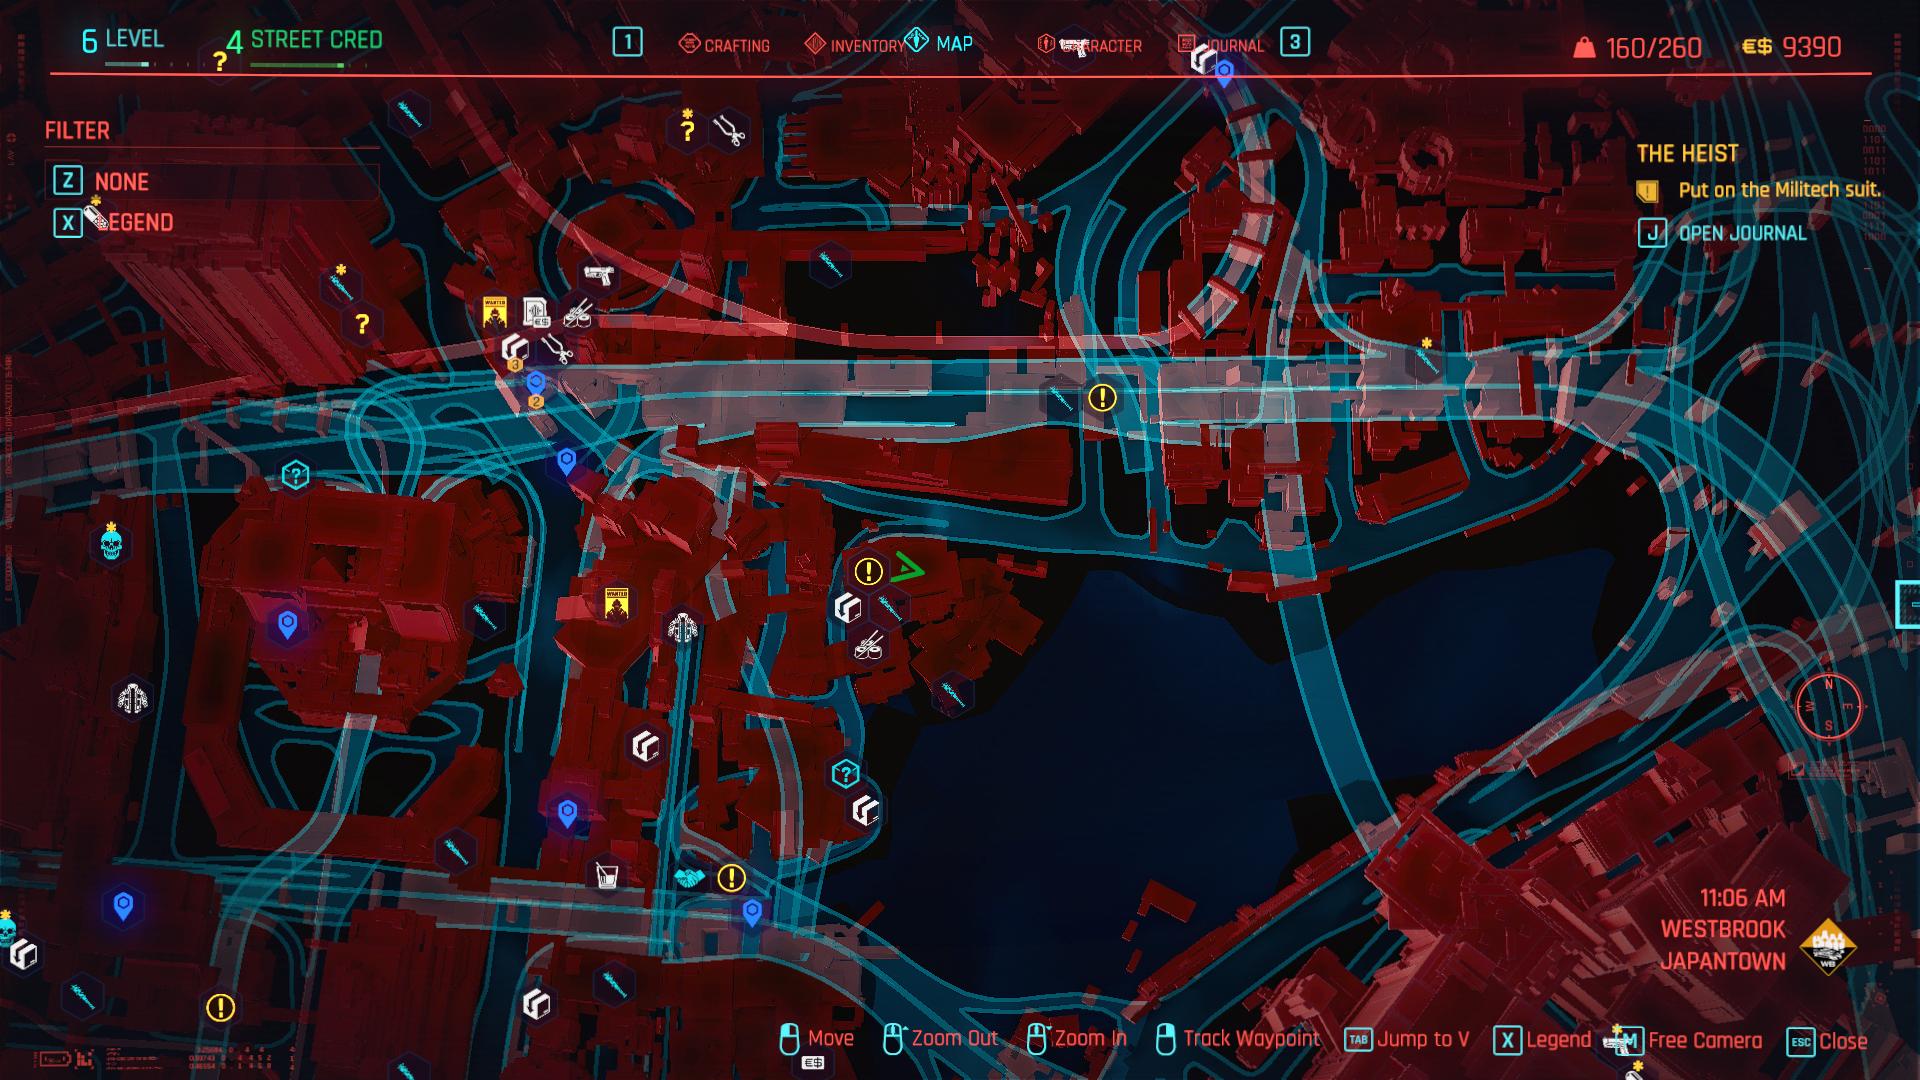 Cyberpunk 2077 monowire